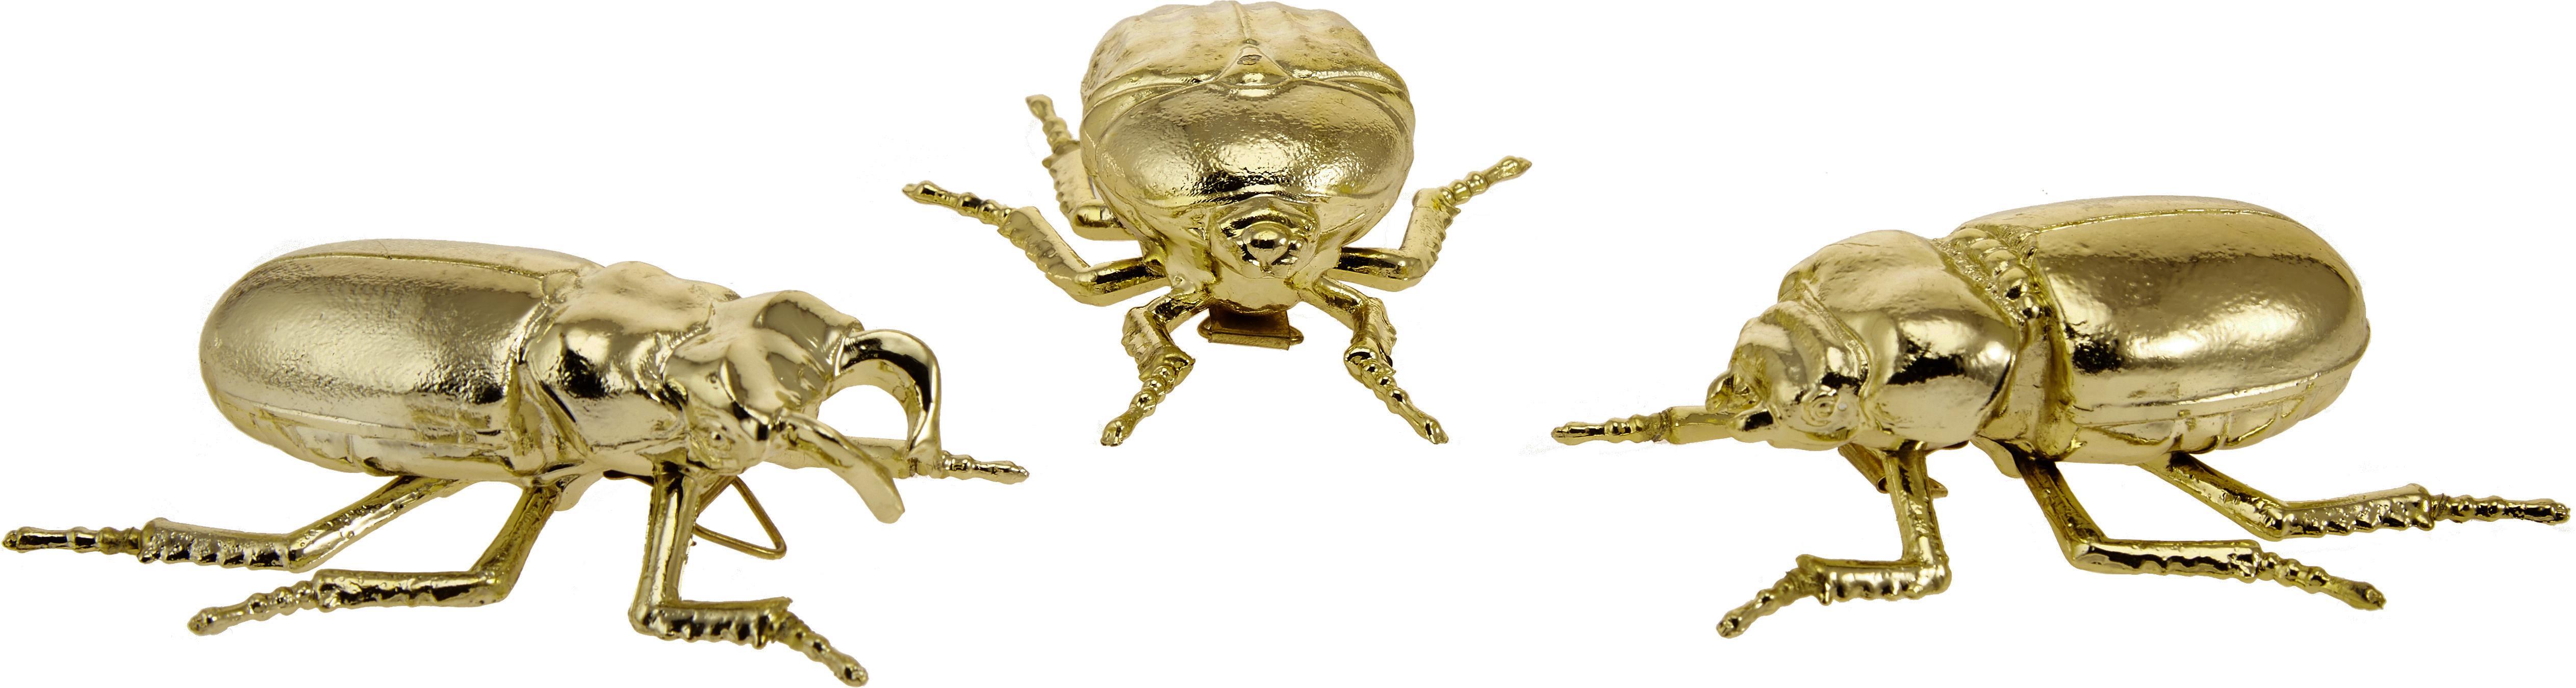 Set scarabei da decorazione Carny, 3 pz., Resina sintetica, Dorato, L 11 x A 4 cm